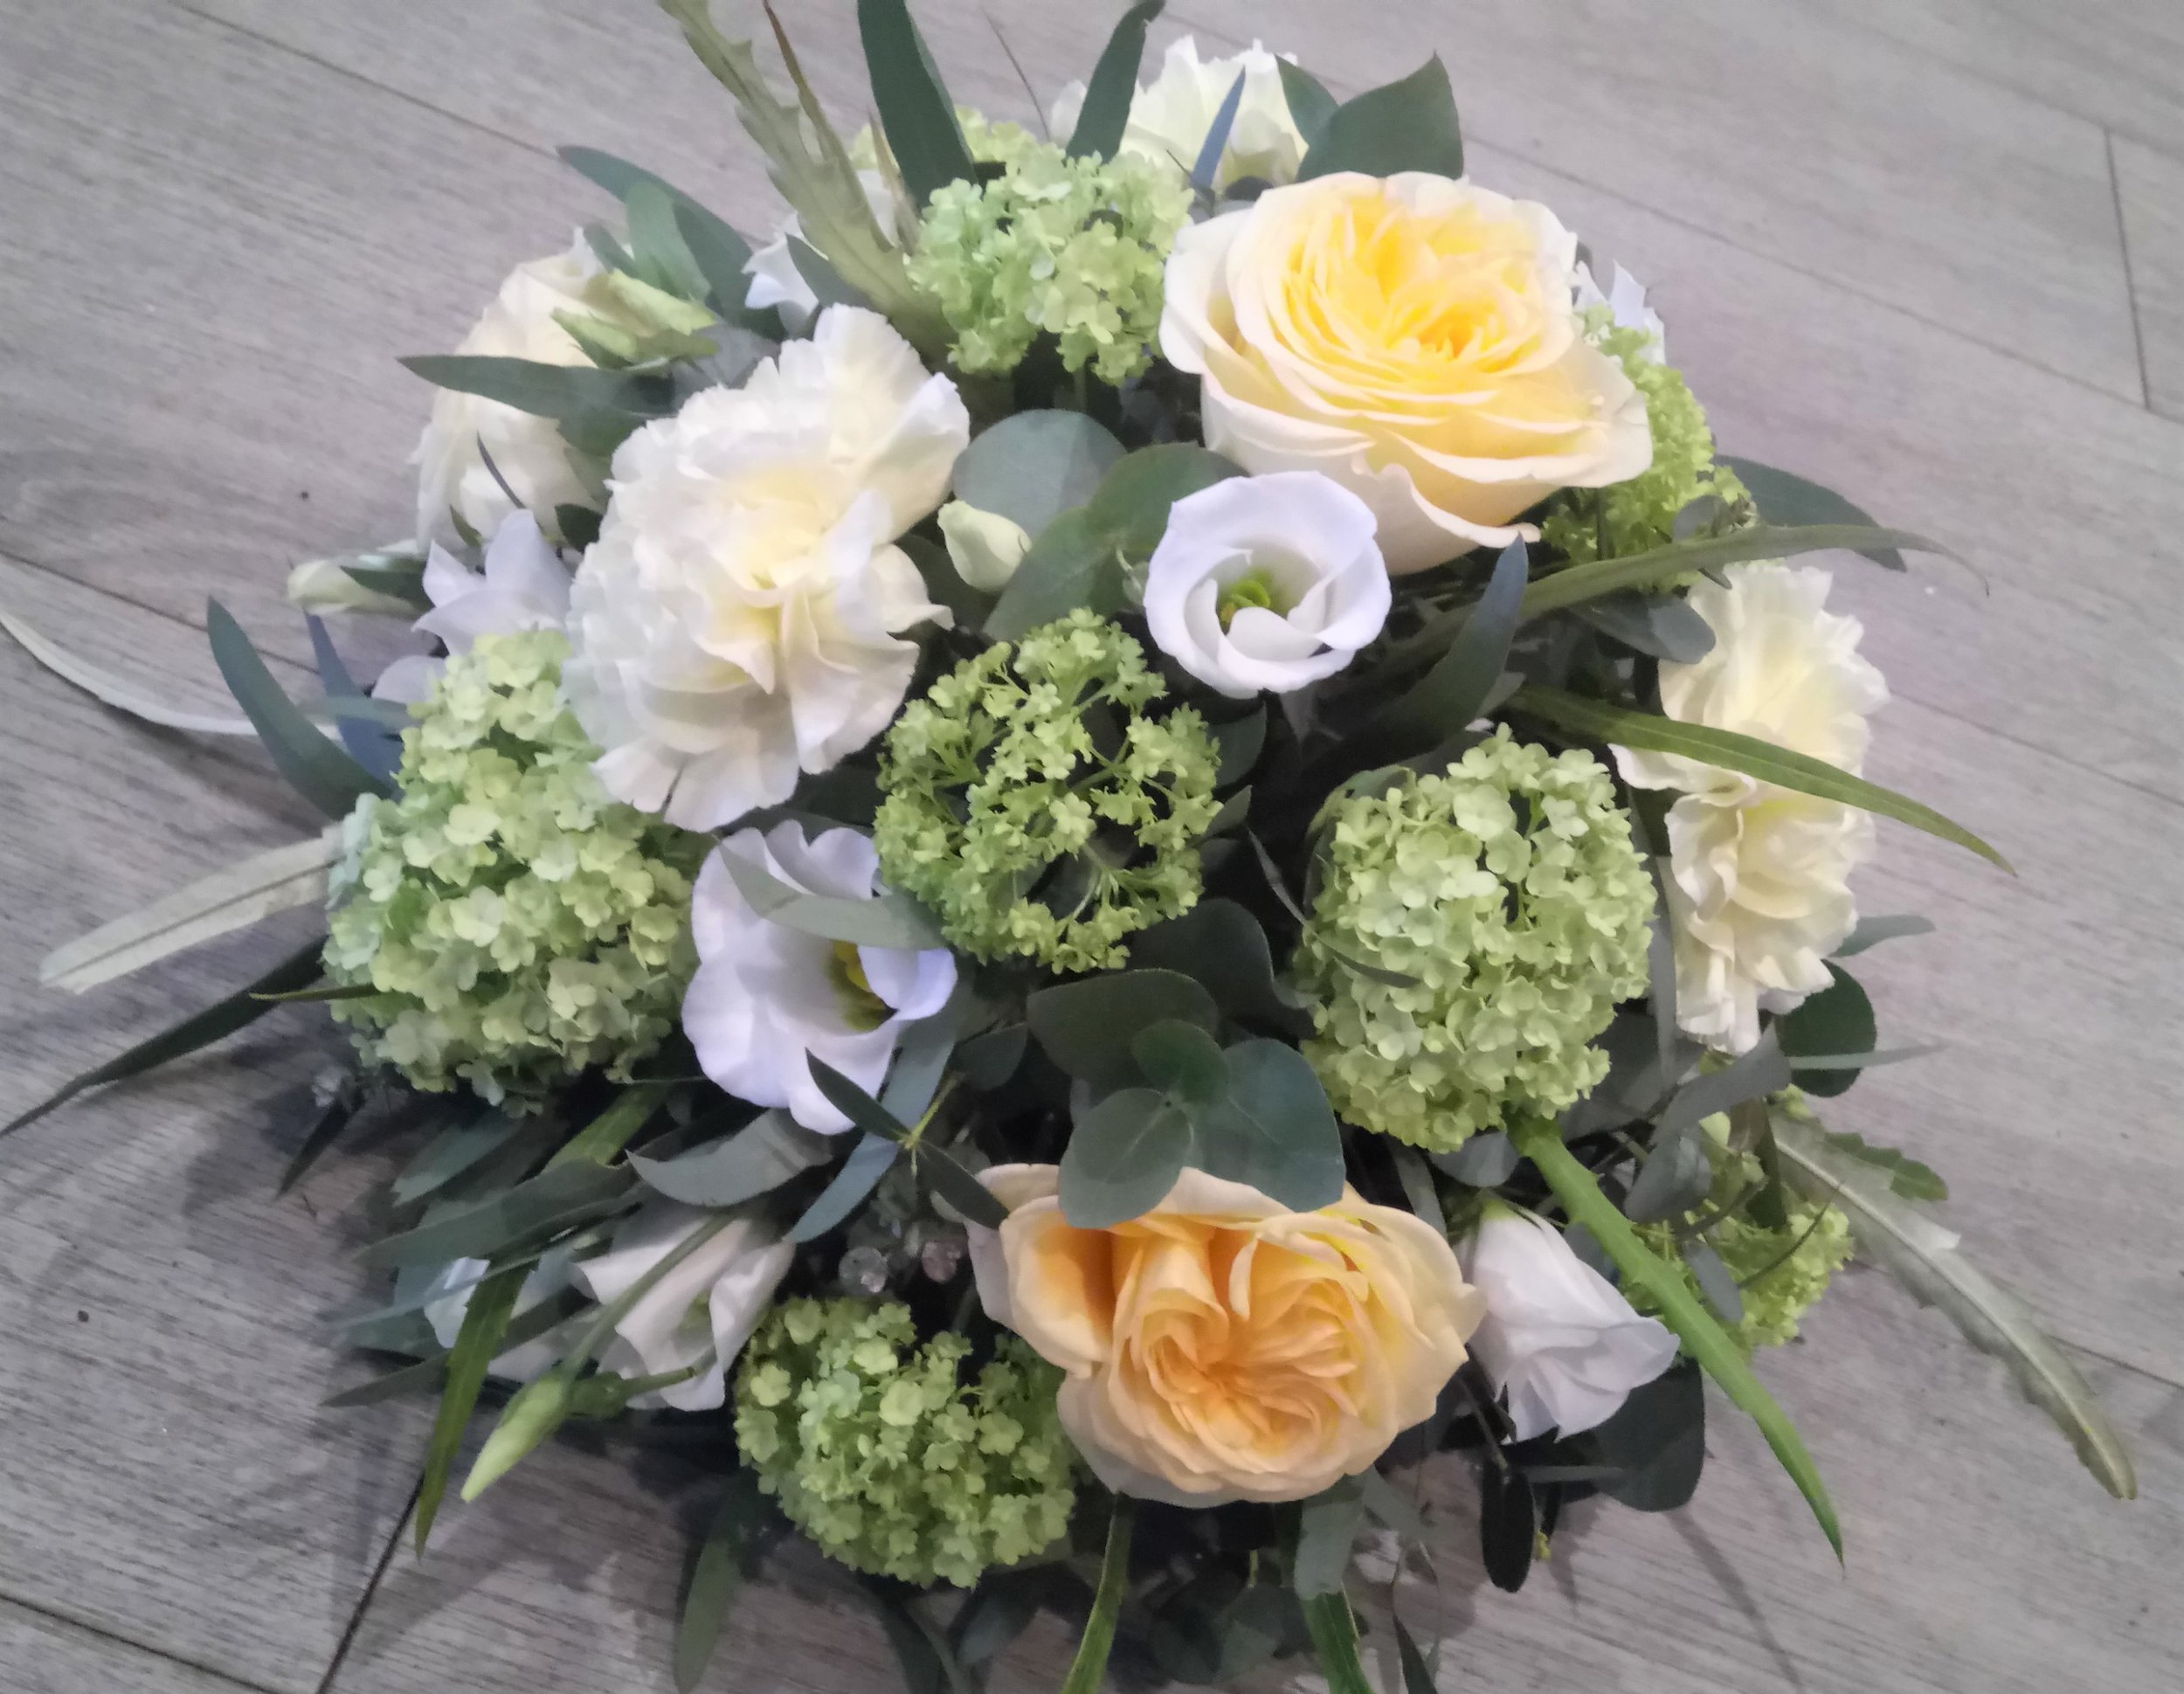 Posy arrangement - Lemon, Green and Cream.JPG